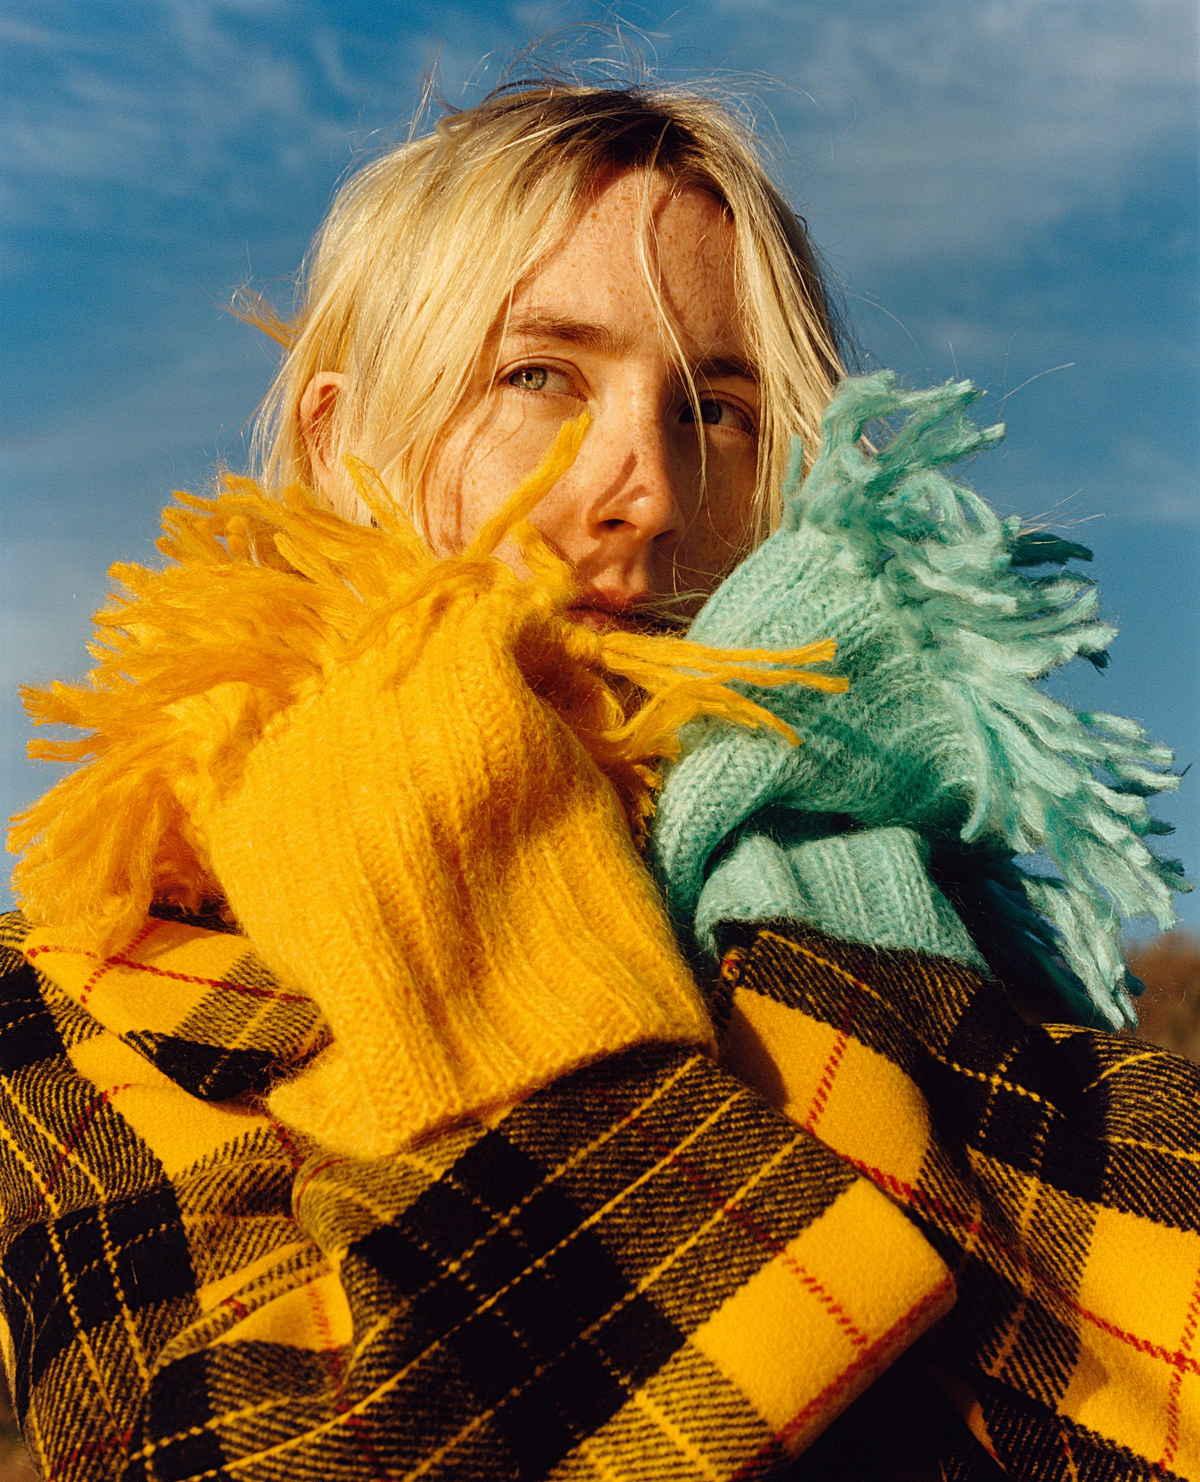 Saoirse-Ronan-US-Vogue-August-201800007.jpg